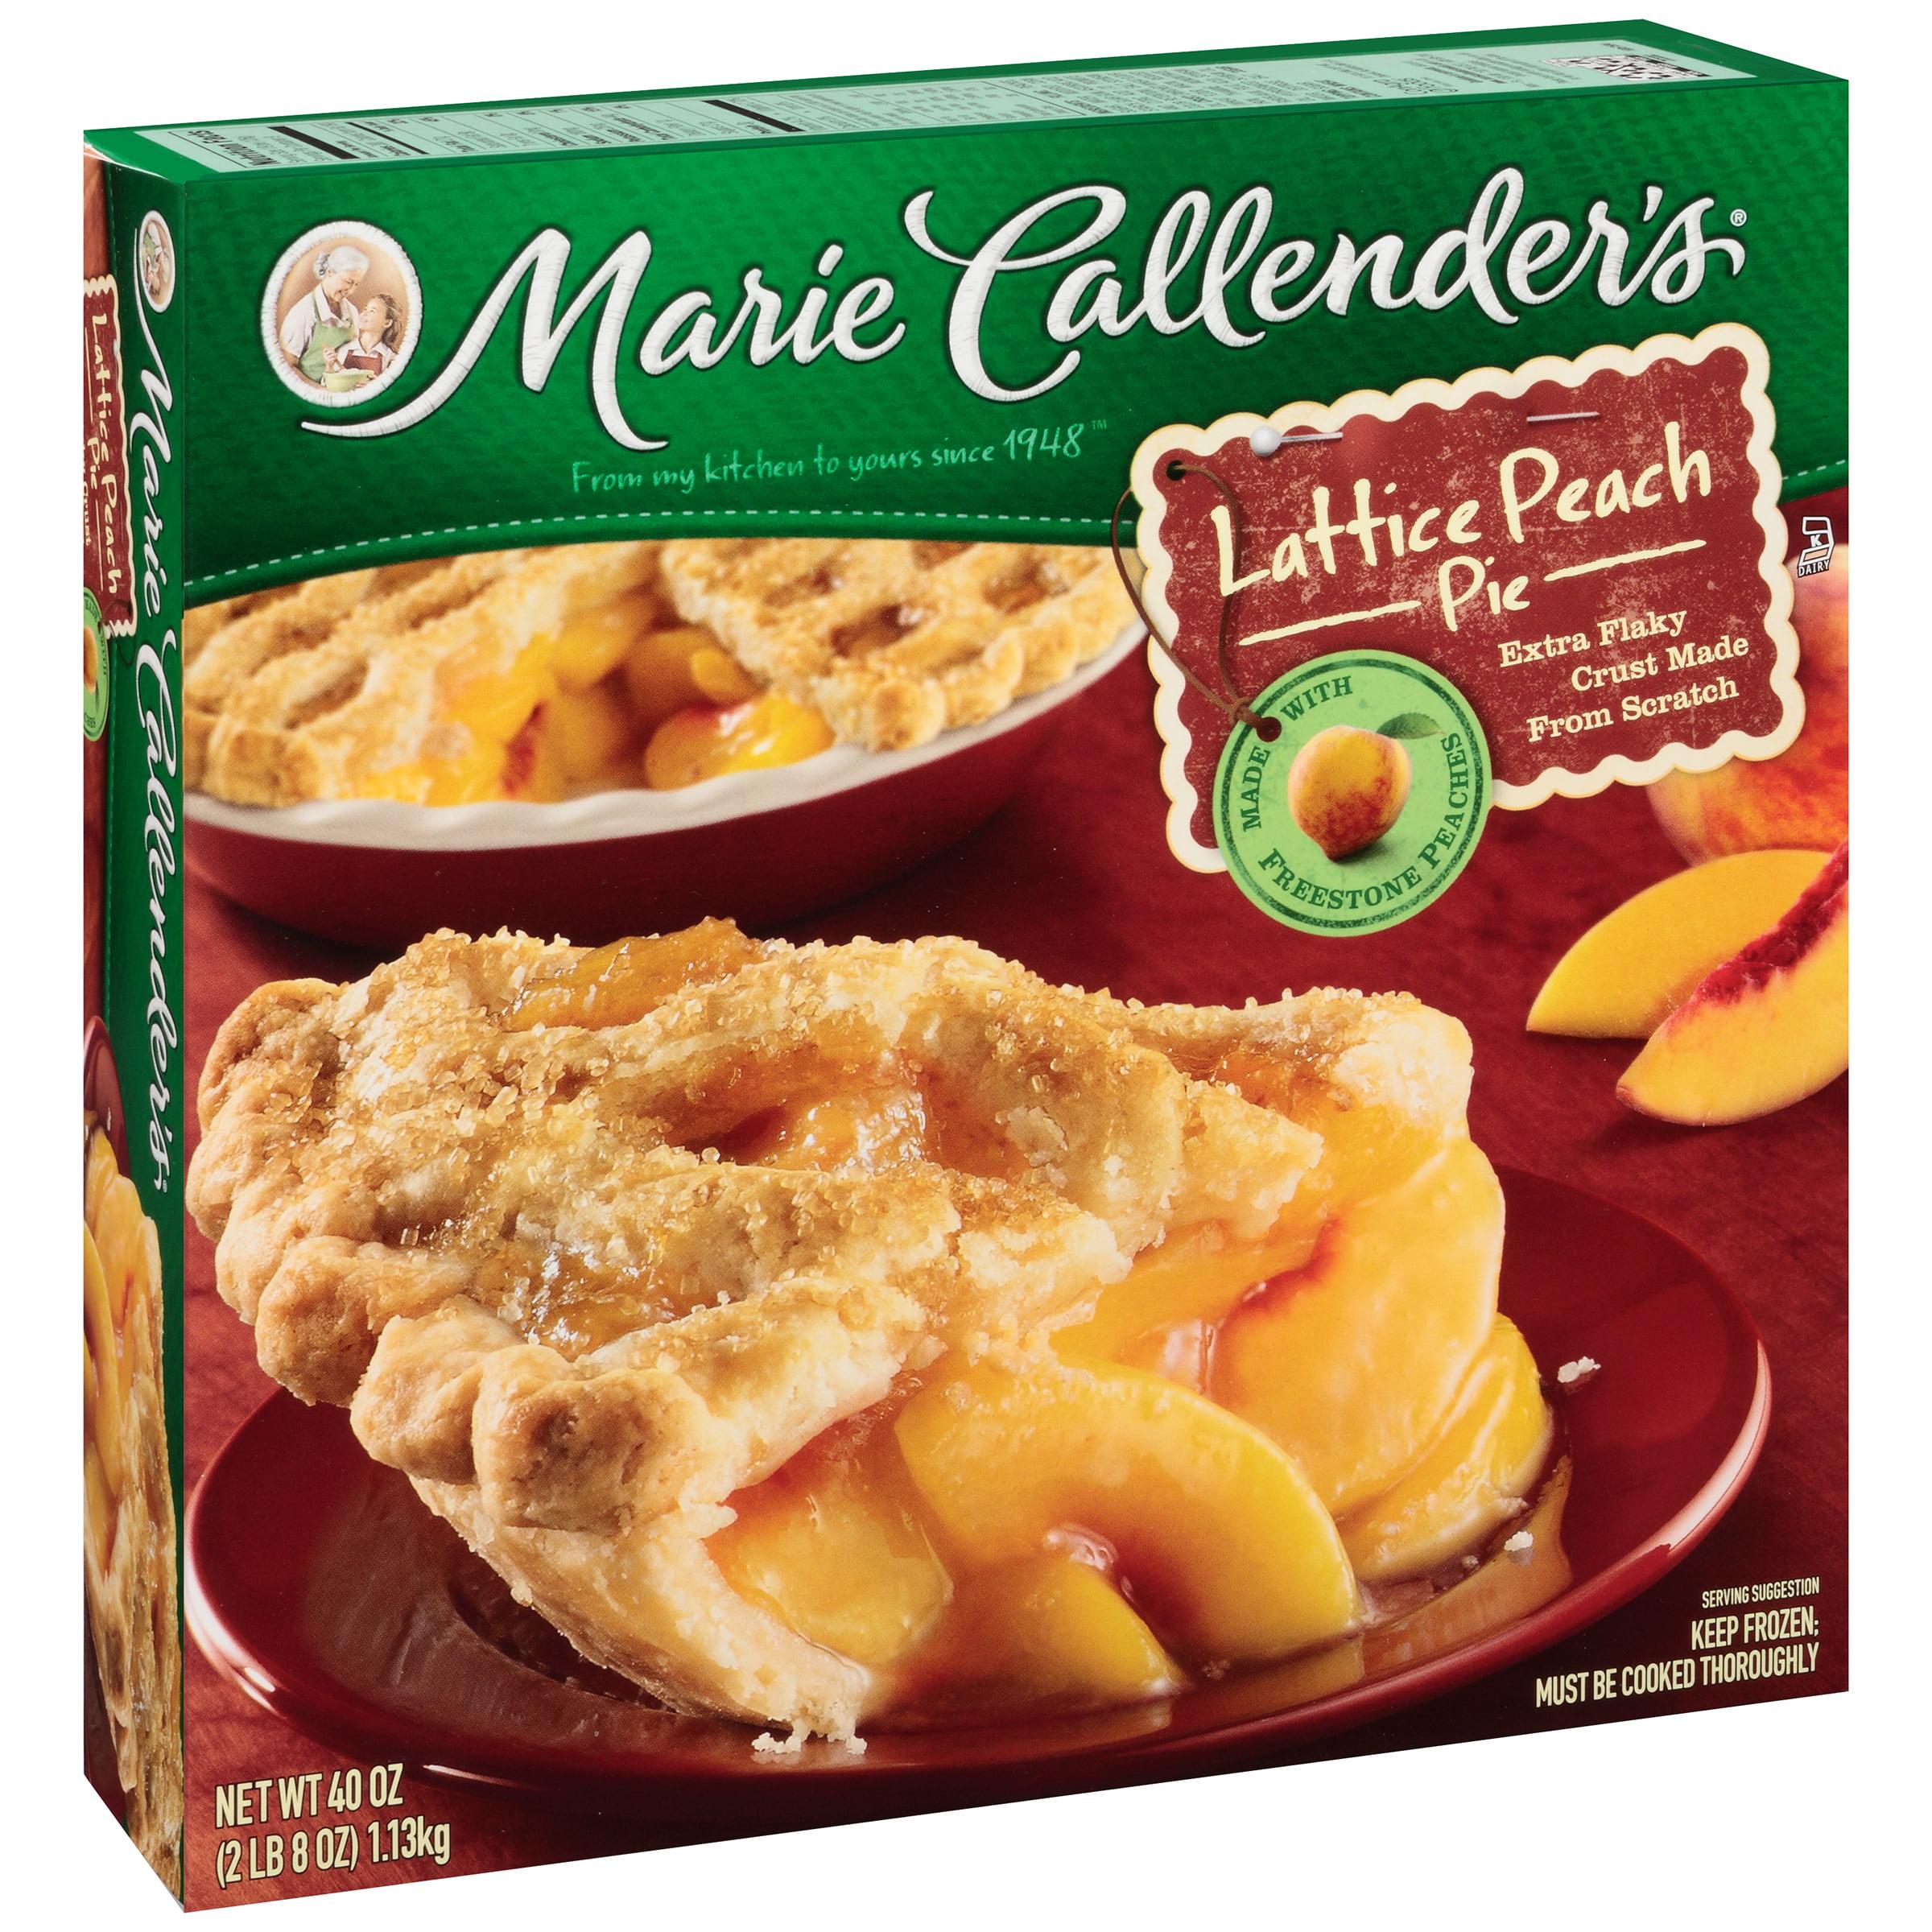 Marie Callender's® Chicken Pot Pie 10 oz. Box - Walmart.com